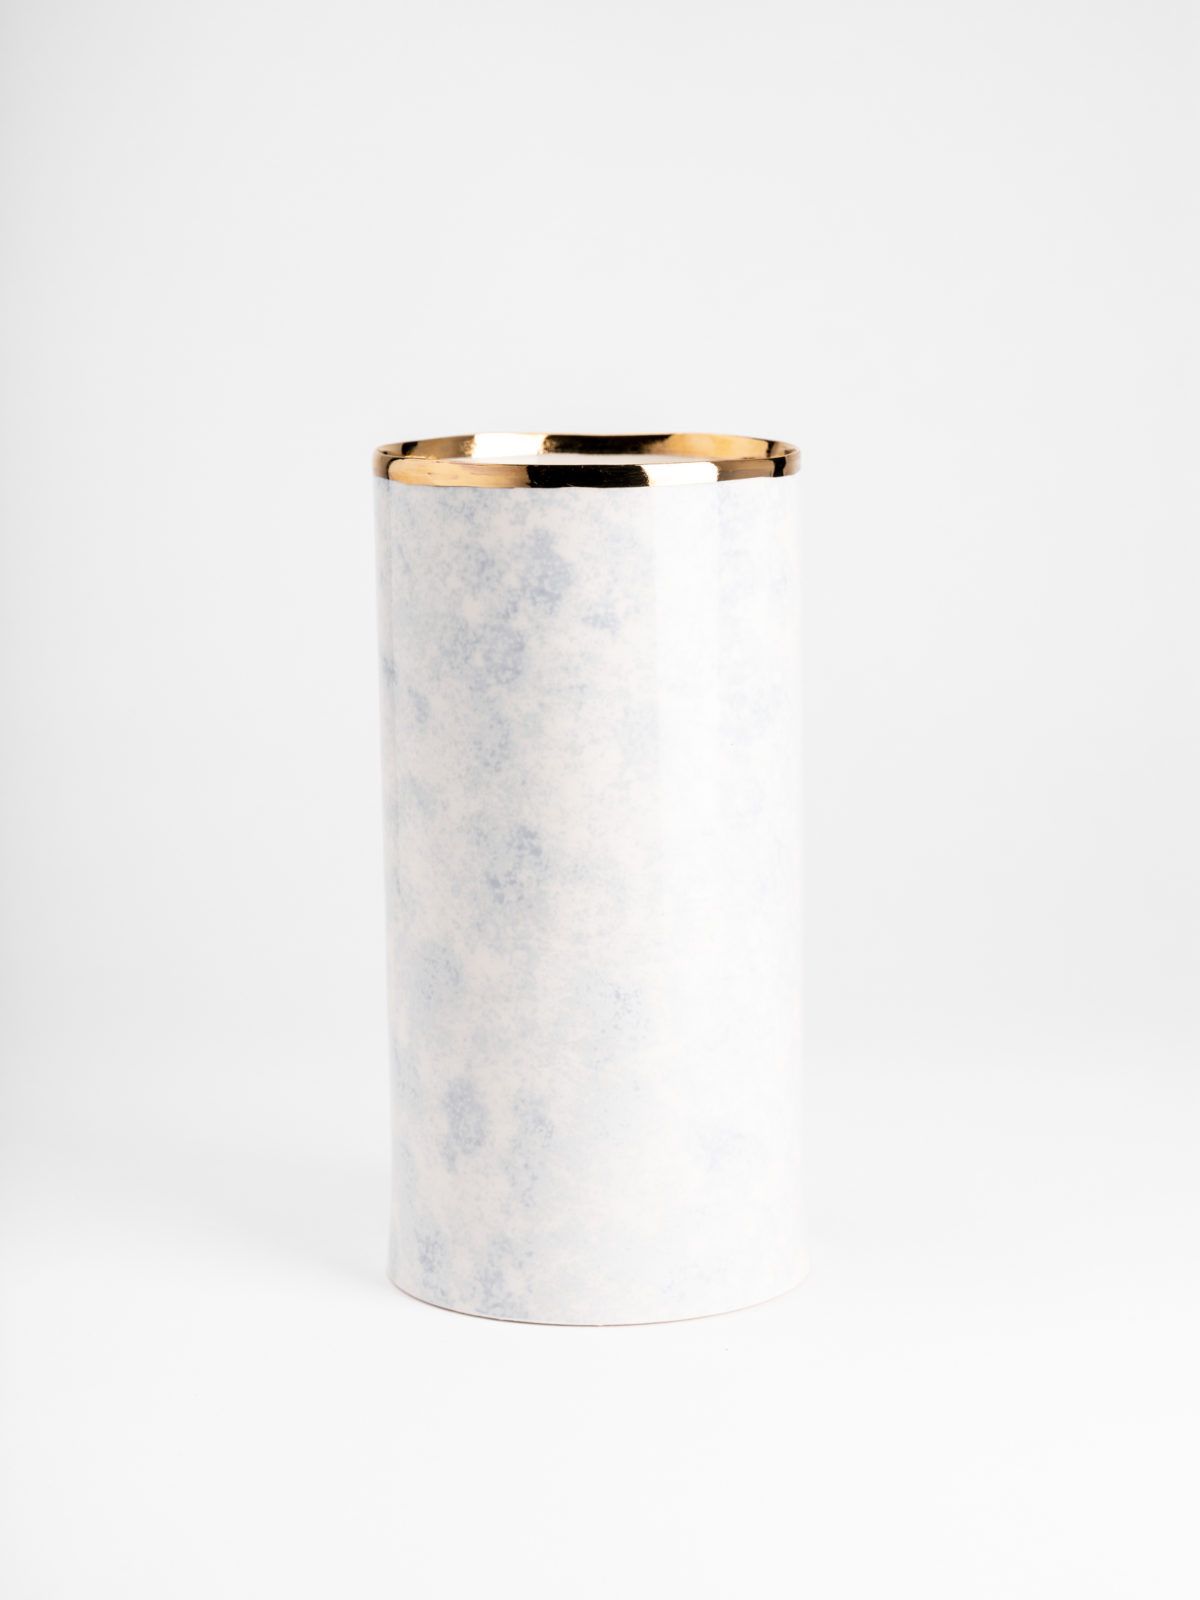 Spoil yourself vase